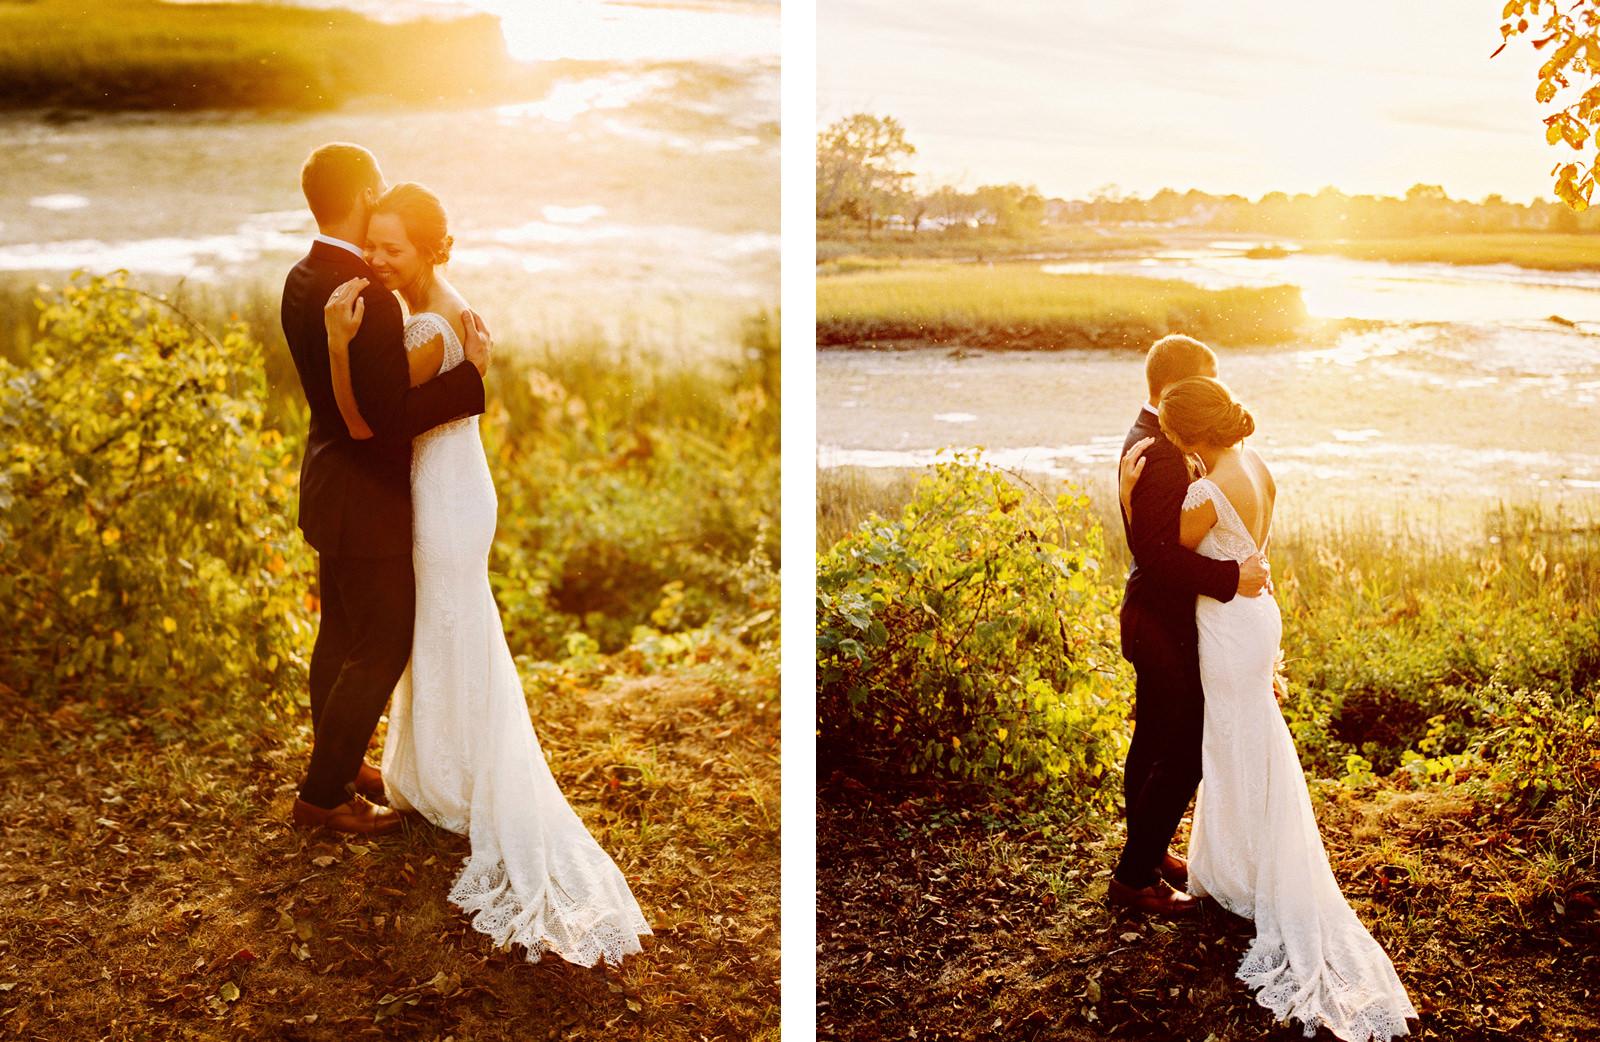 bridgeport-wedding-124 BRIDGEPORT, CONNECTICUT BACKYARD WEDDING